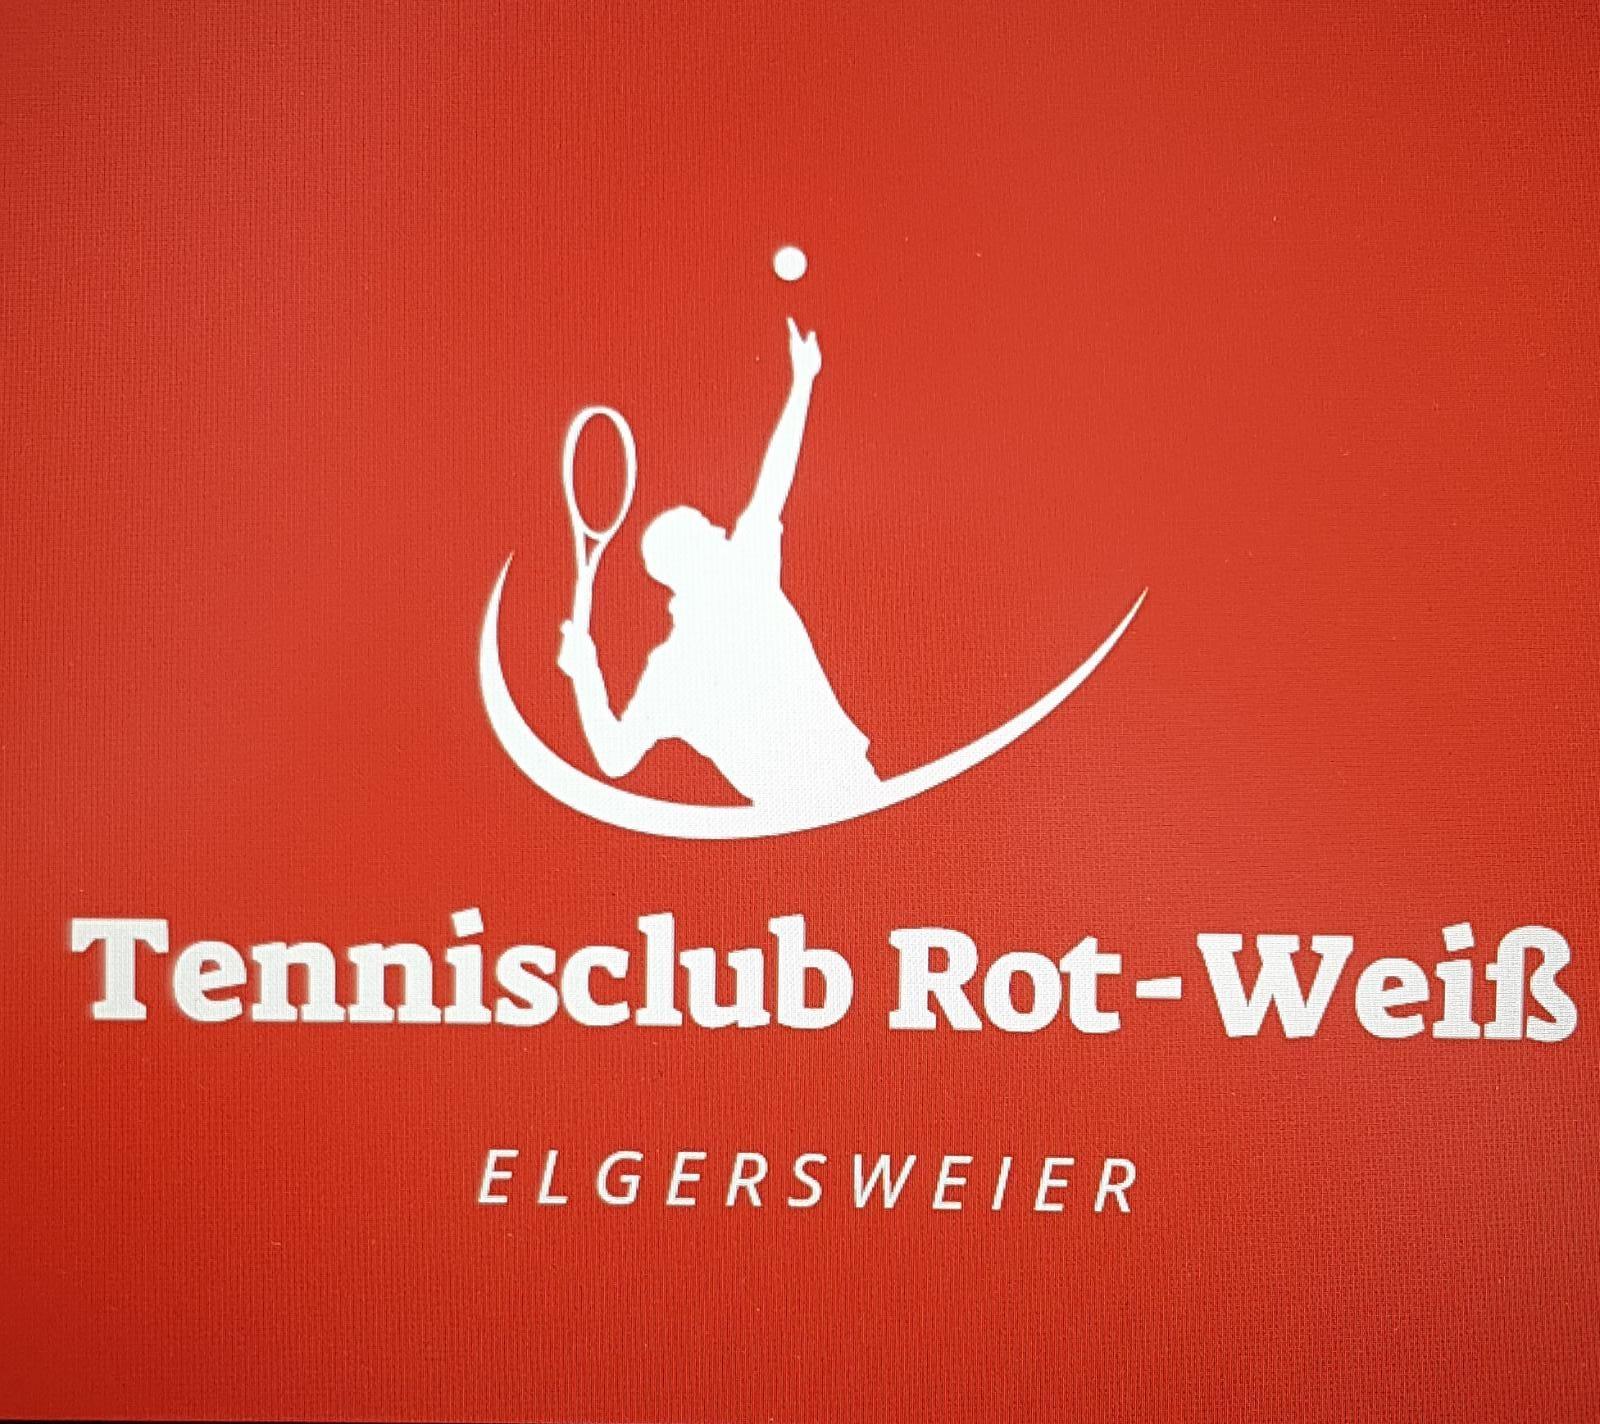 ccb0da354b8953 Tennisclub Rot-Weiß Elgersweier